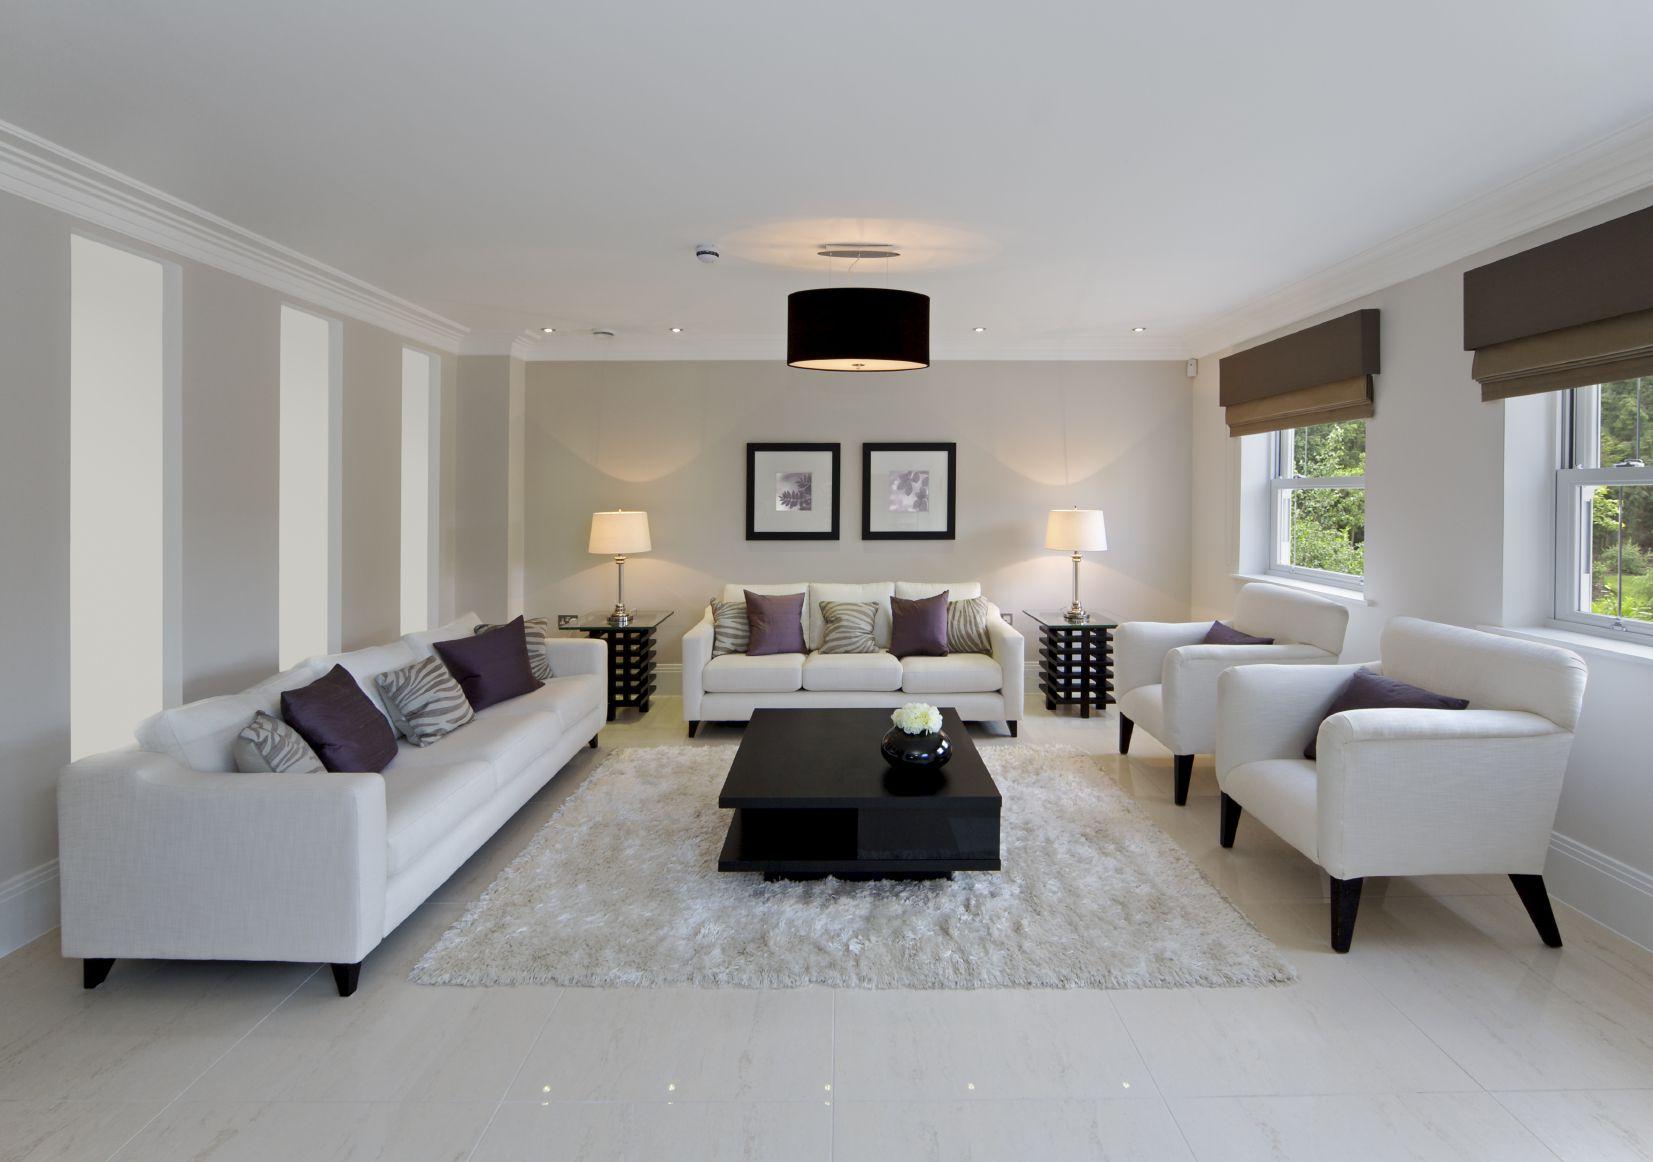 485 Modern Living Room Ideas for 2018 Black coffee